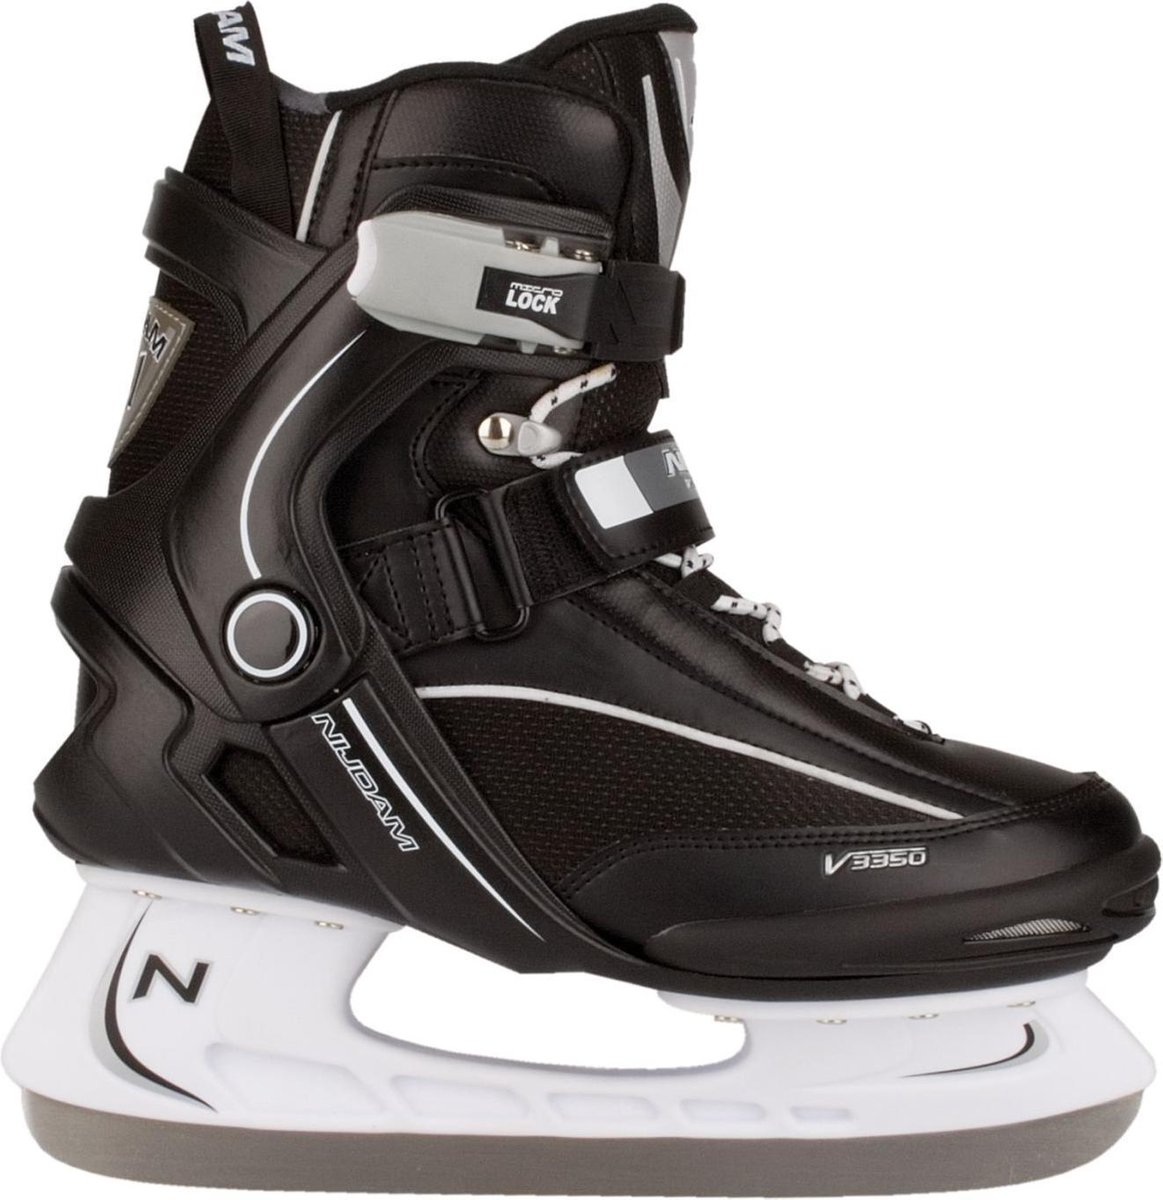 Nijdam IJshockeyschaats - Semi-Softboot - Zwart/Wit - Maat 43